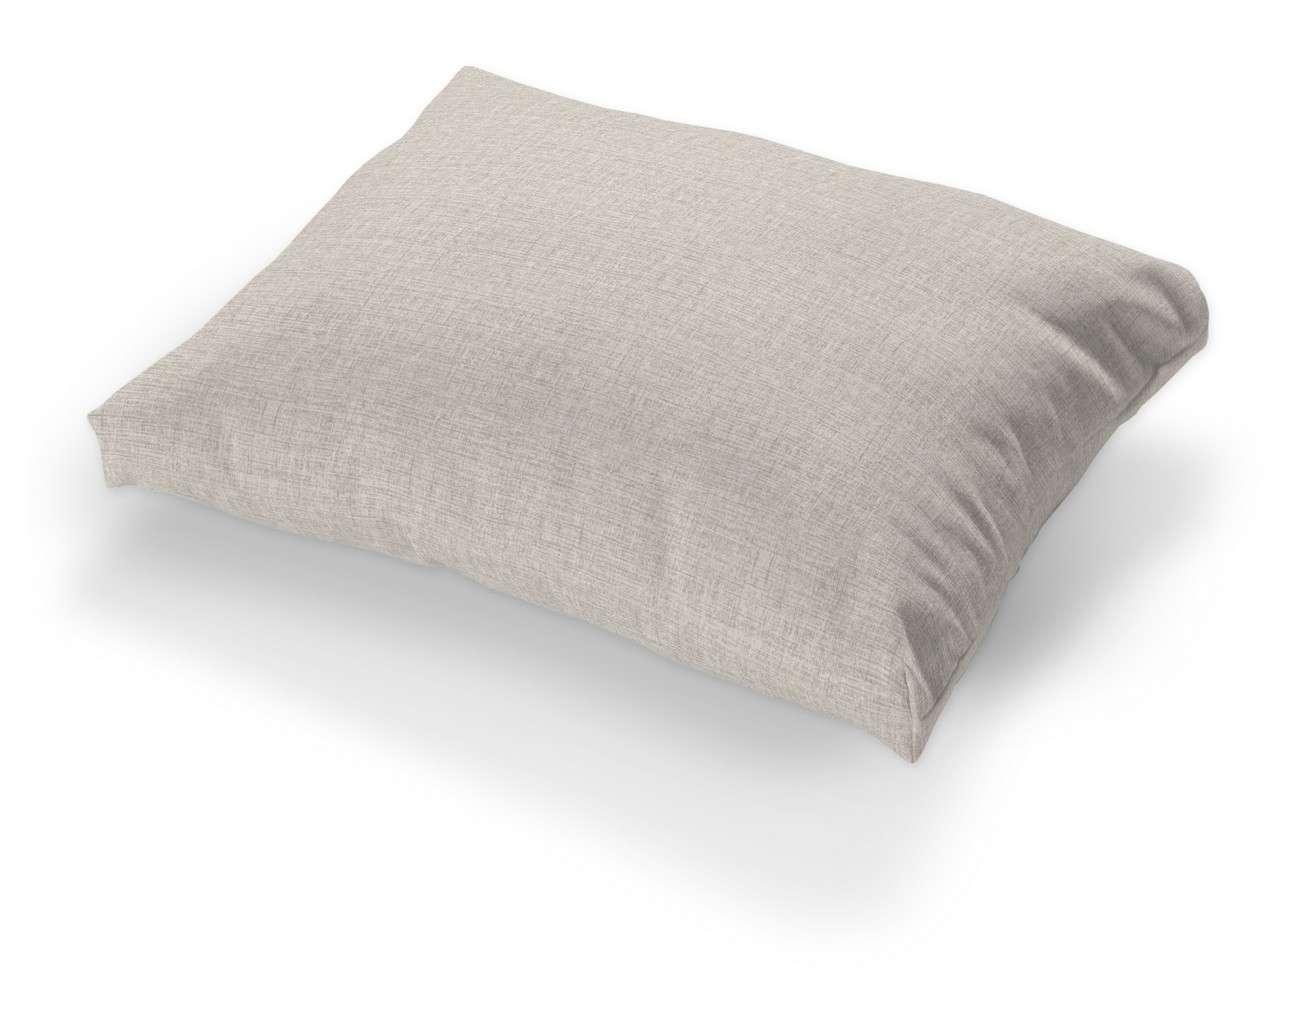 Poszewka na poduszkę Tylösand 1 szt. w kolekcji Living, tkanina: 161-00